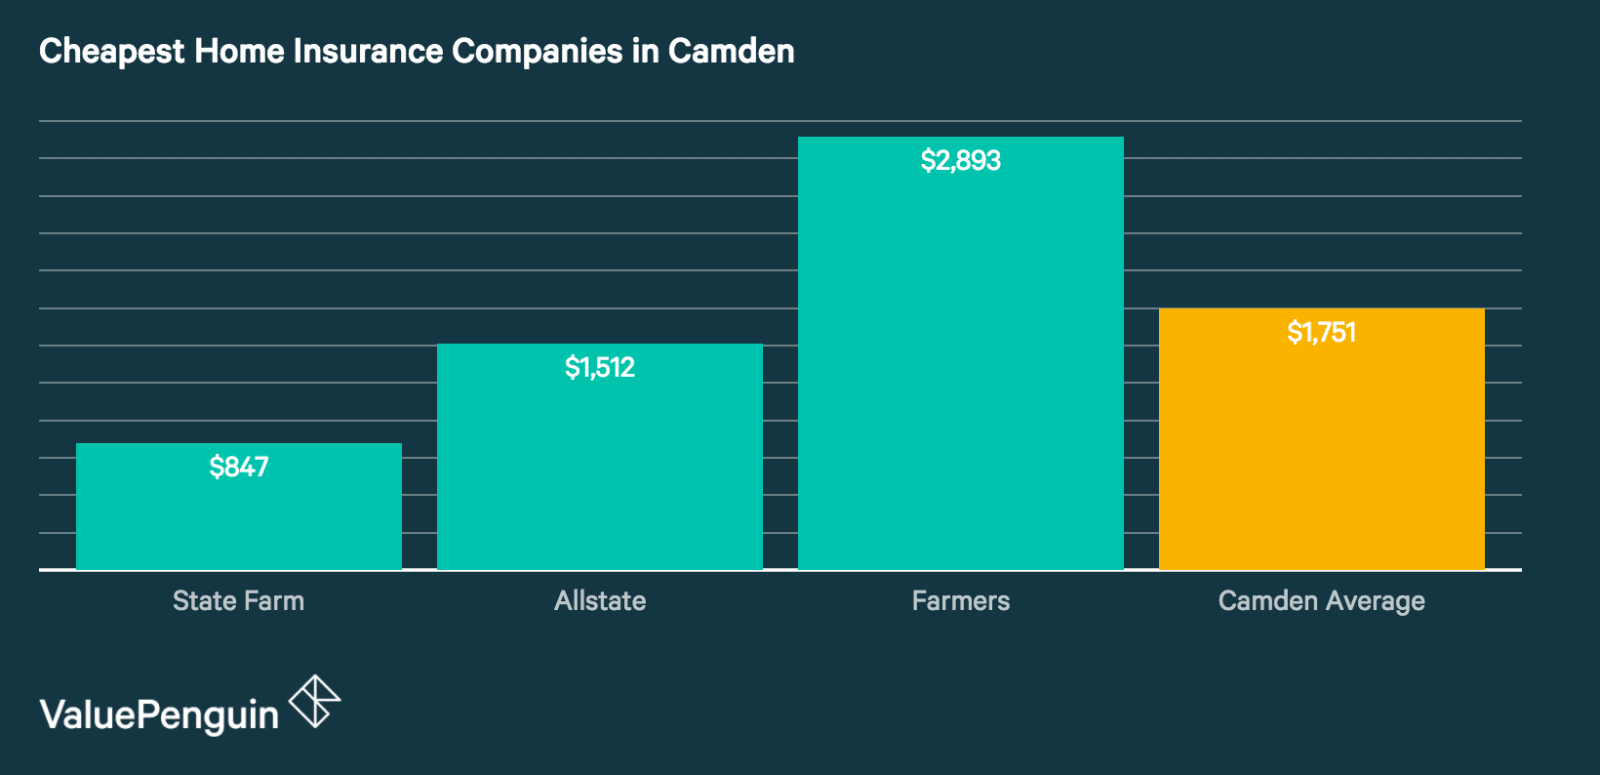 Best Home Insurance Companies in Camden